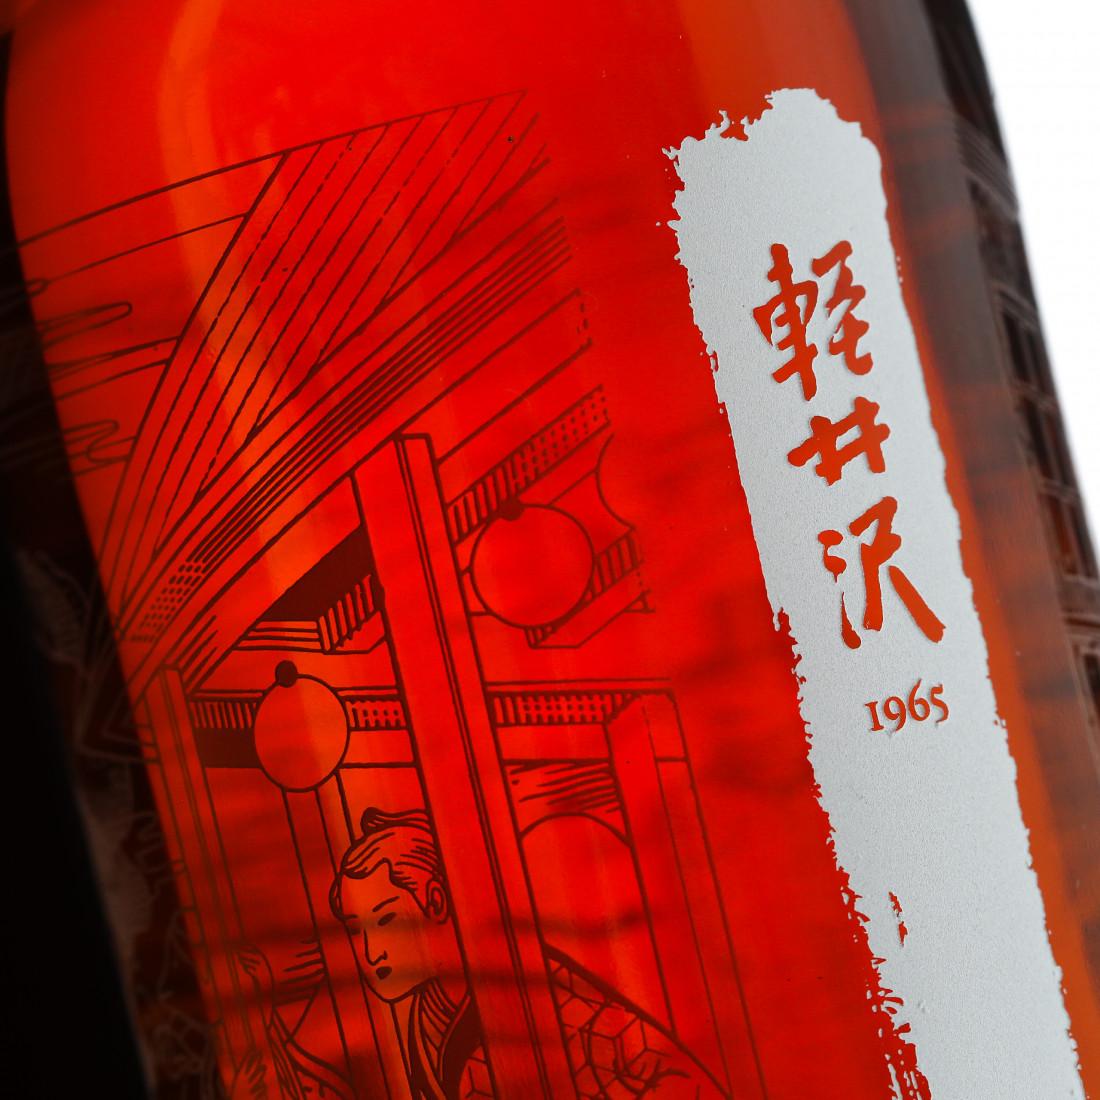 Karuizawa 1965 Japonisme Edition / LMDW 60th Anniversary